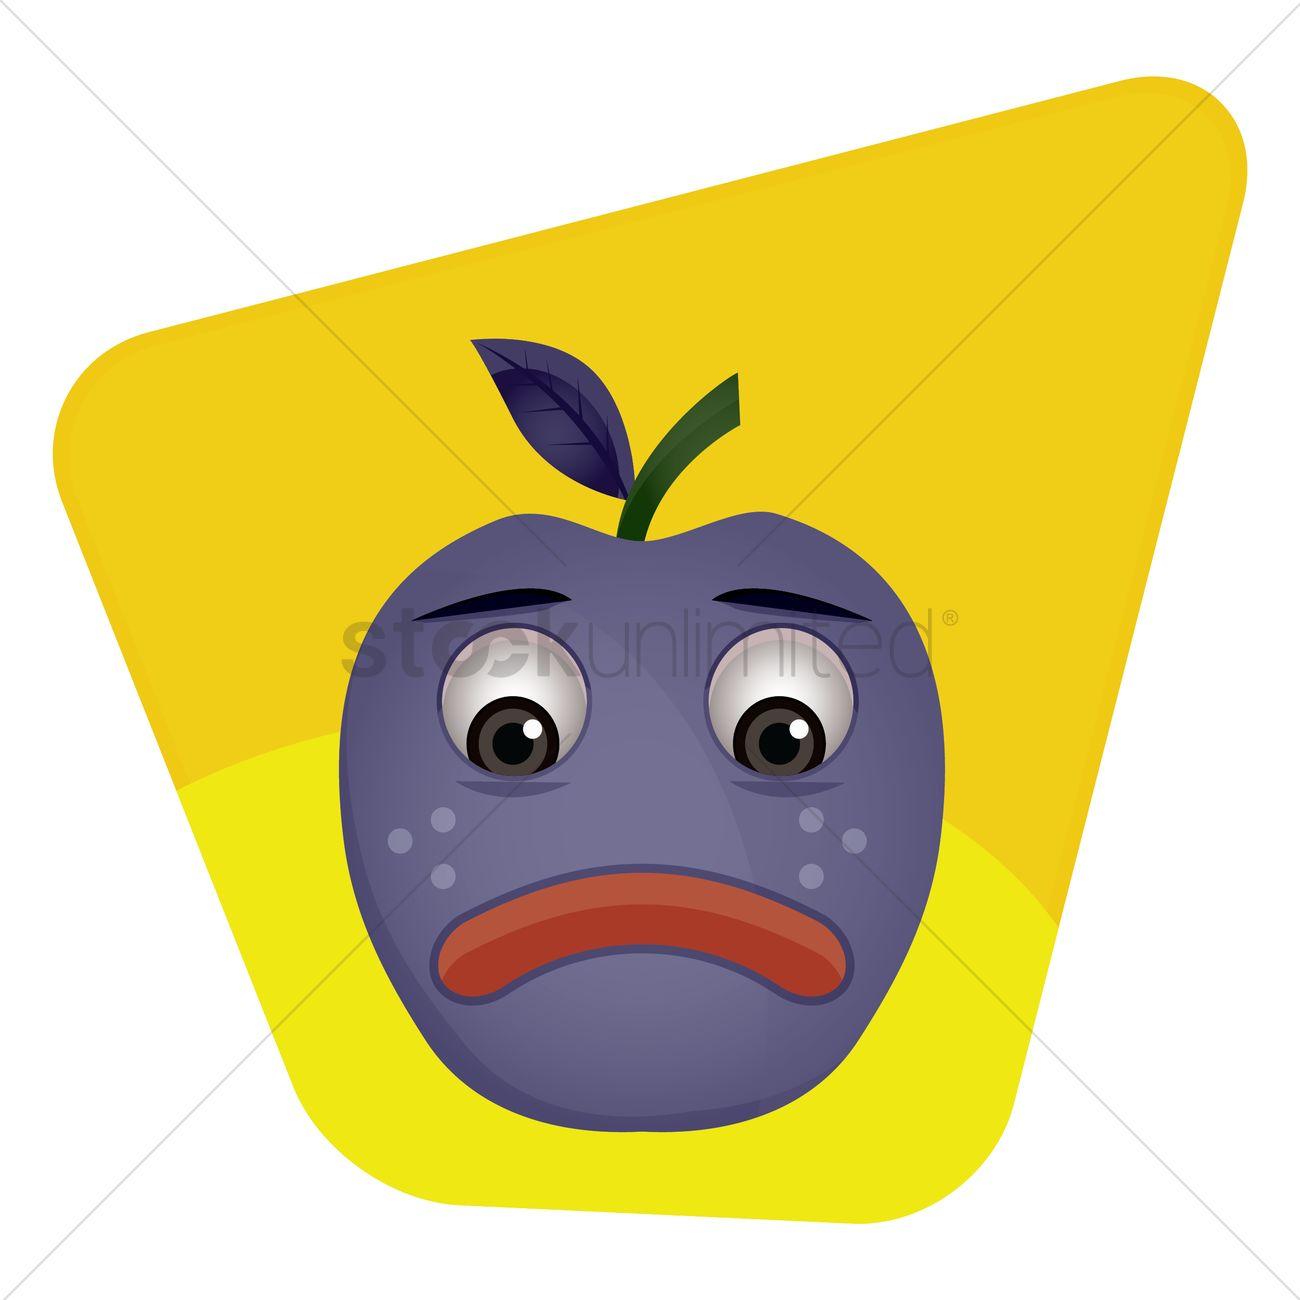 Emoticon Upset Vector Image 1396192 Stockunlimited